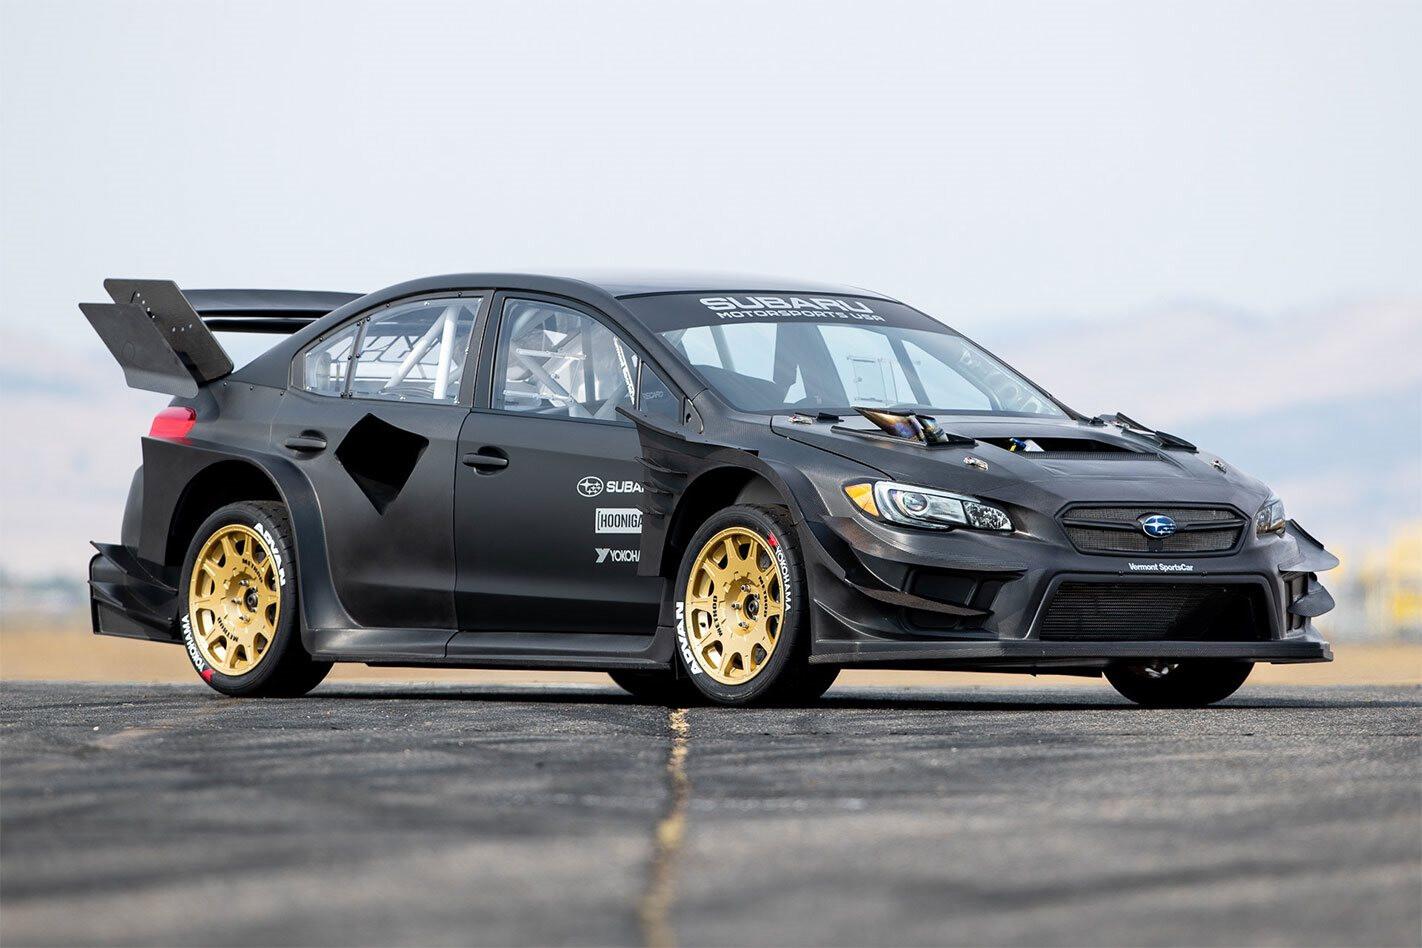 Travis Pastrana Gymkhana Subaru WRX STI